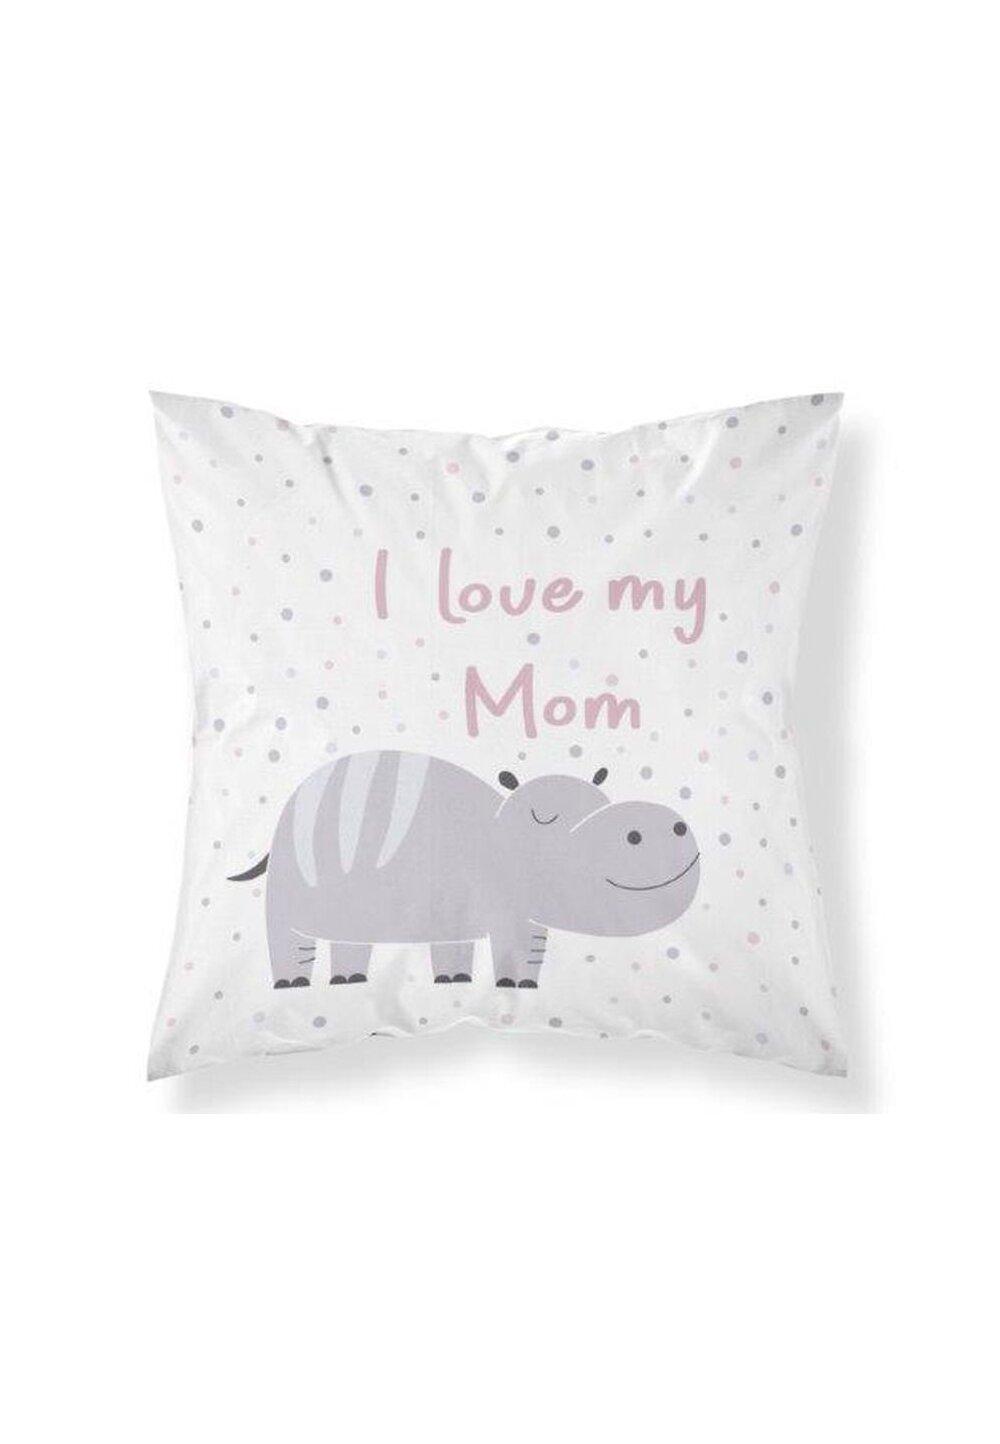 Fata perna, I Iove my mom, roz, 40x40 cm imagine